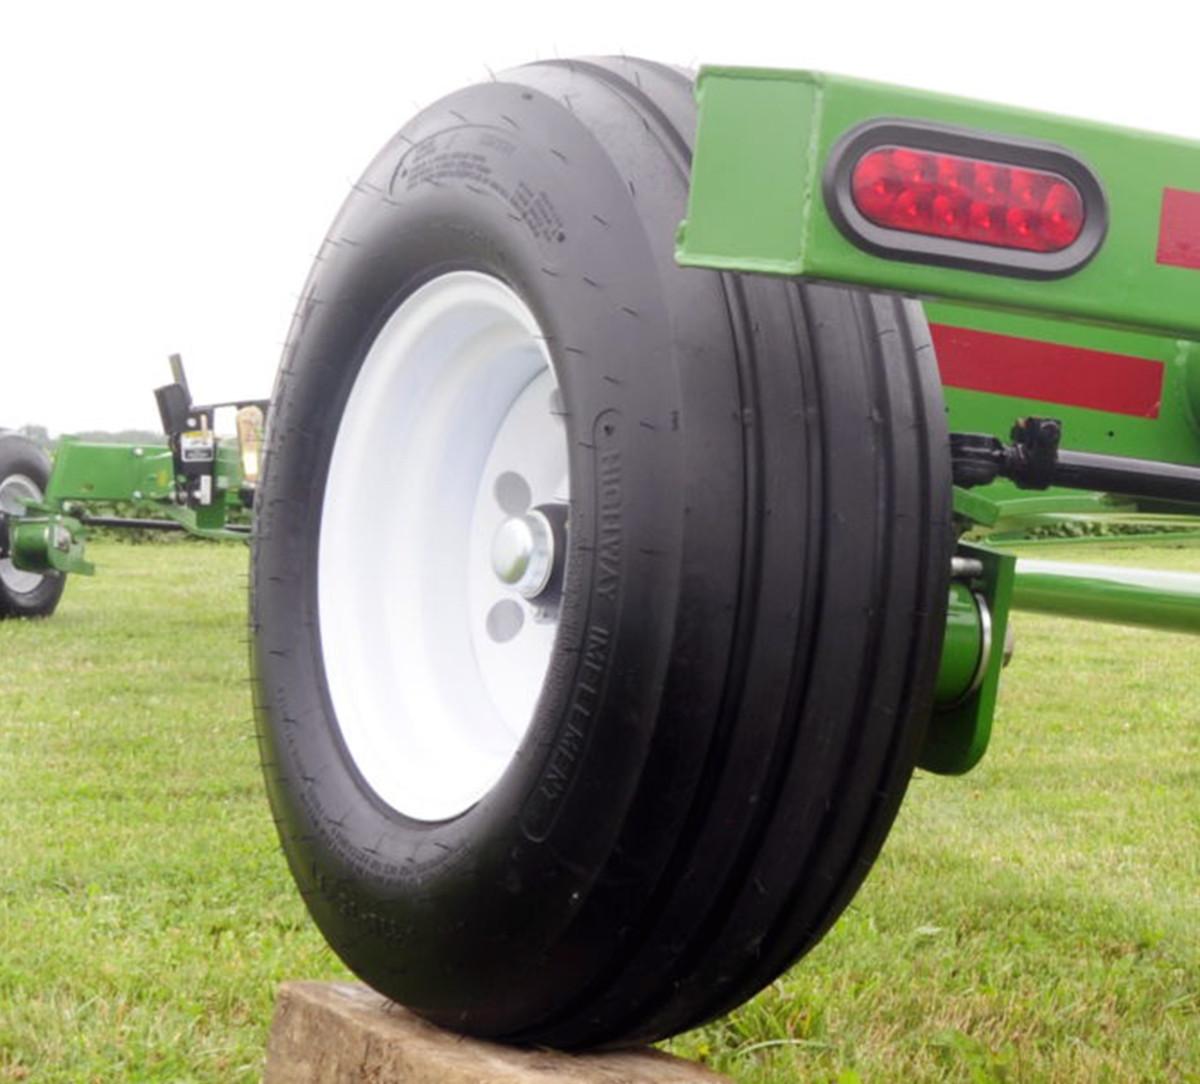 fieldrunner unverferth header transports large diameter 11lx15 tires large diameter 11lx15